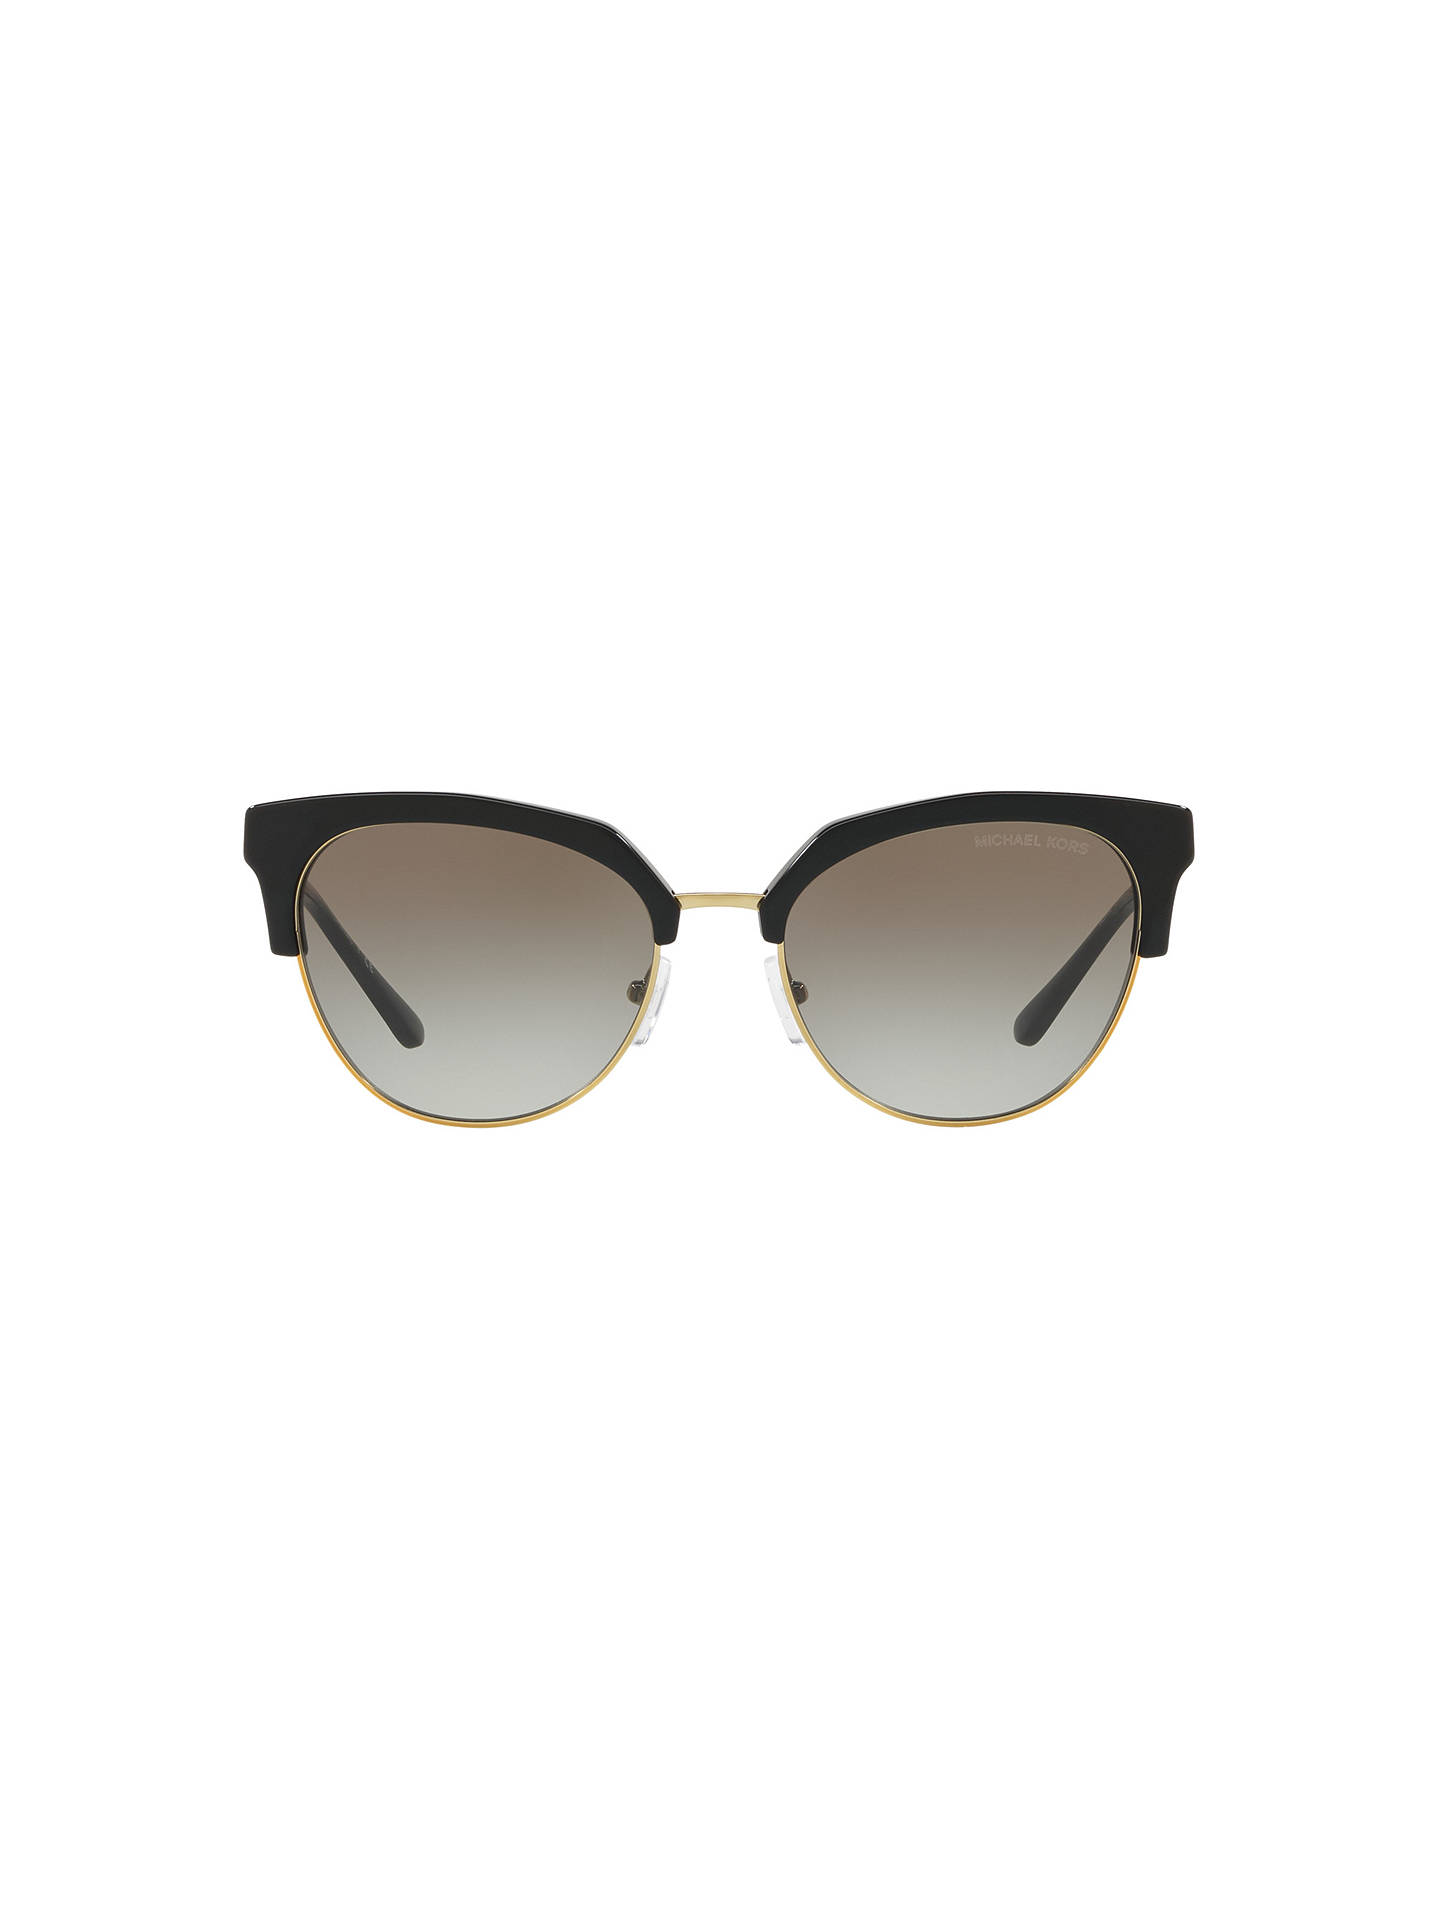 94a0ea345b BuyMichael Kors MK1033 Women s Savannah Cat s Eye Sunglasses